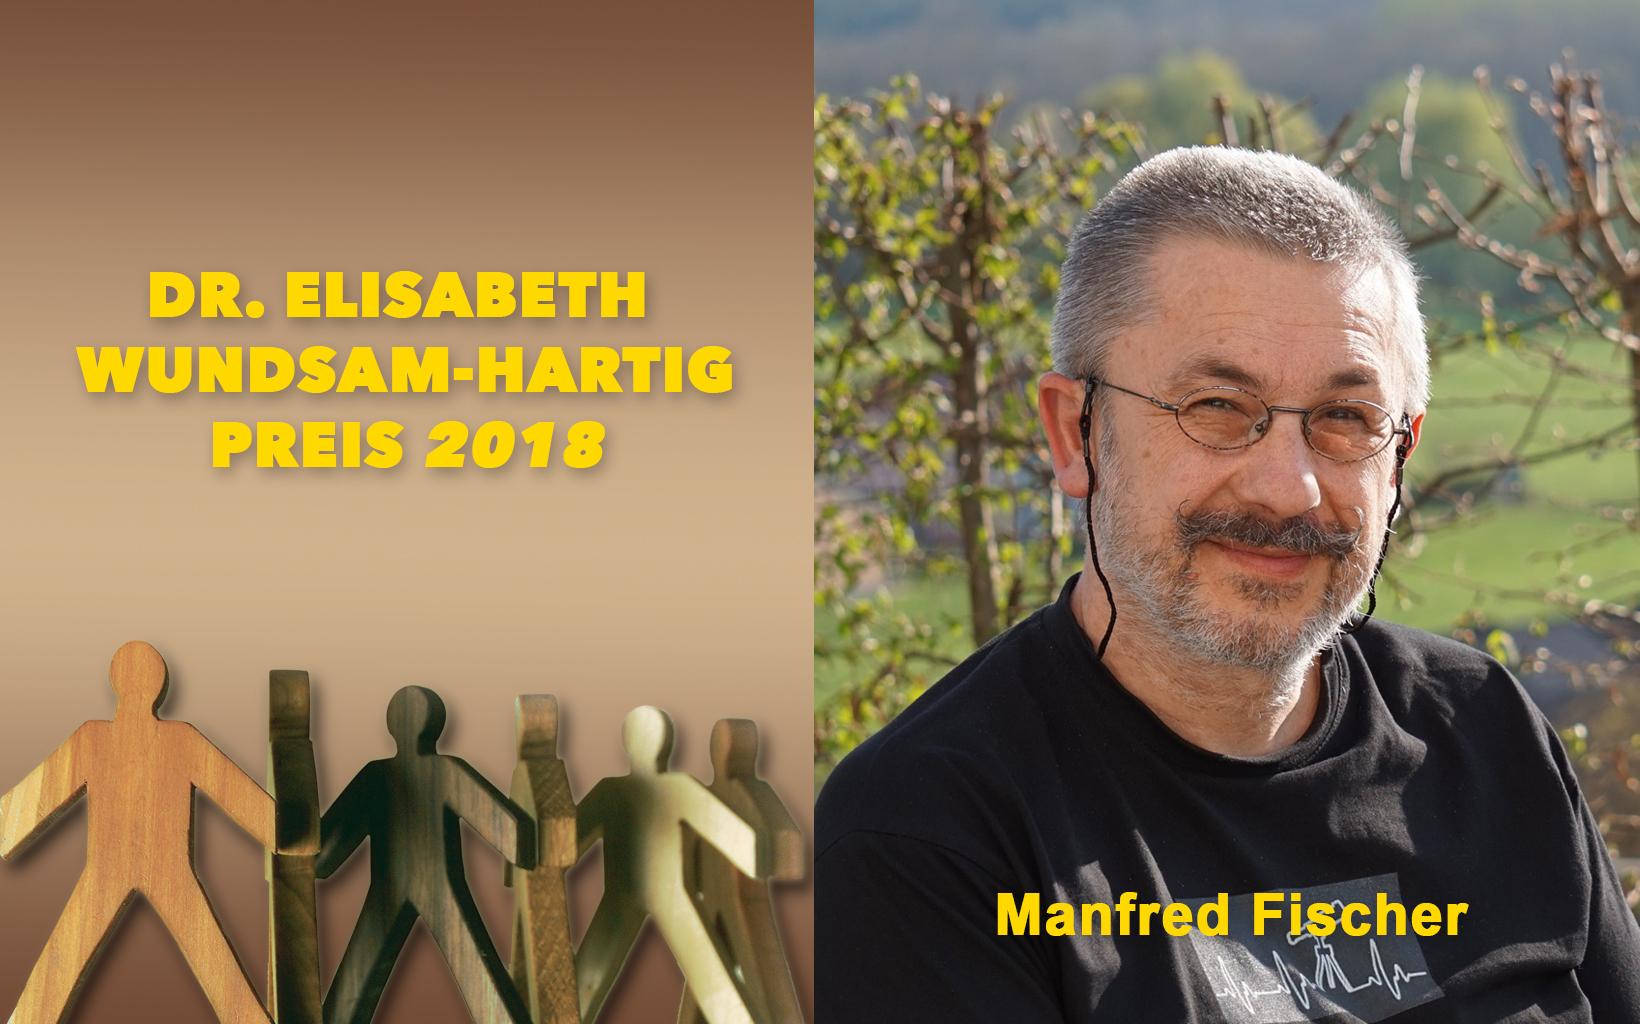 Dr. Elisabeth Wundsam-Hartig Preis 2018 - Preisträger Manfred Fischer